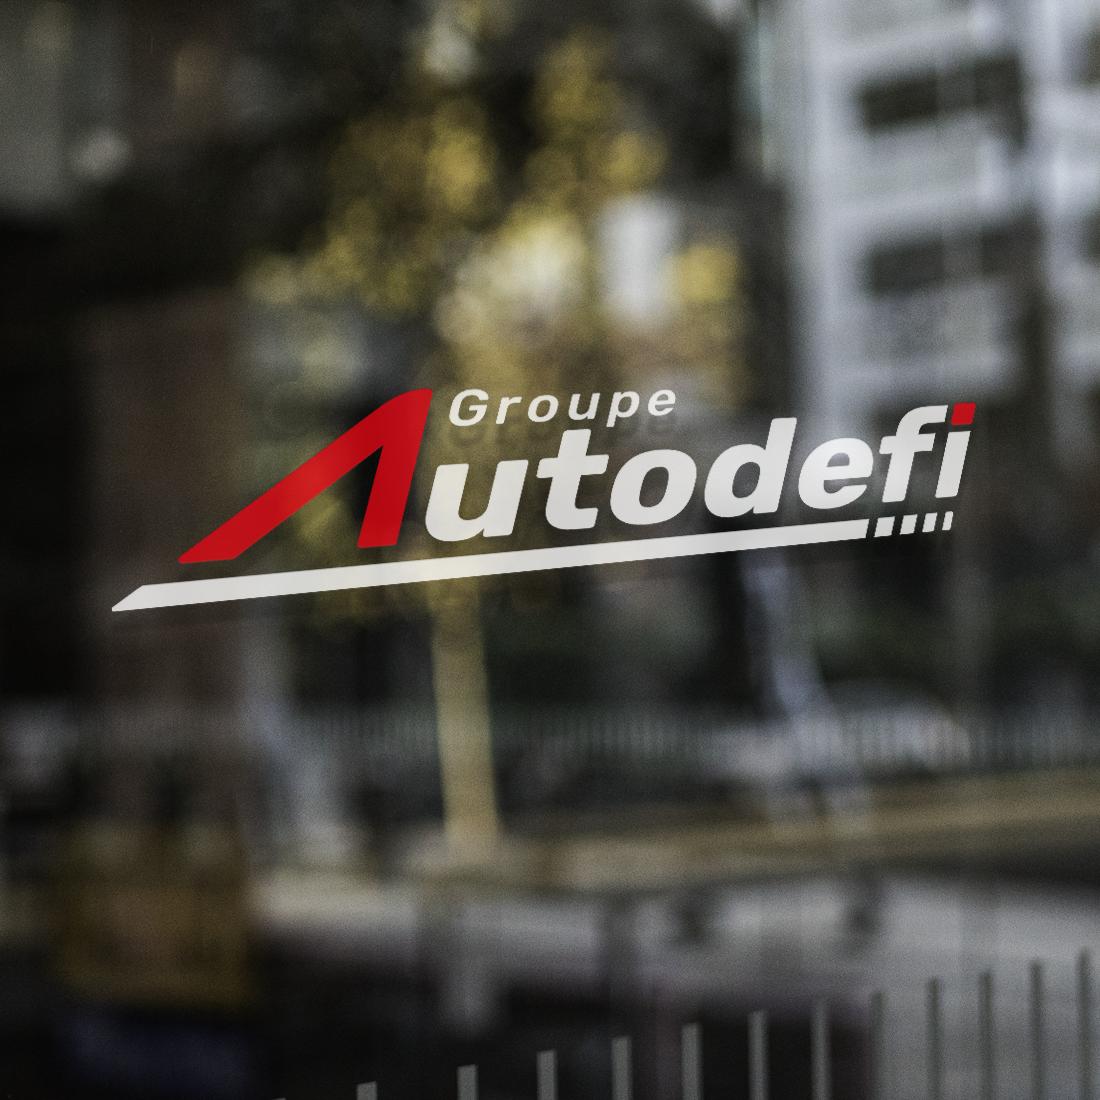 autodefi_1